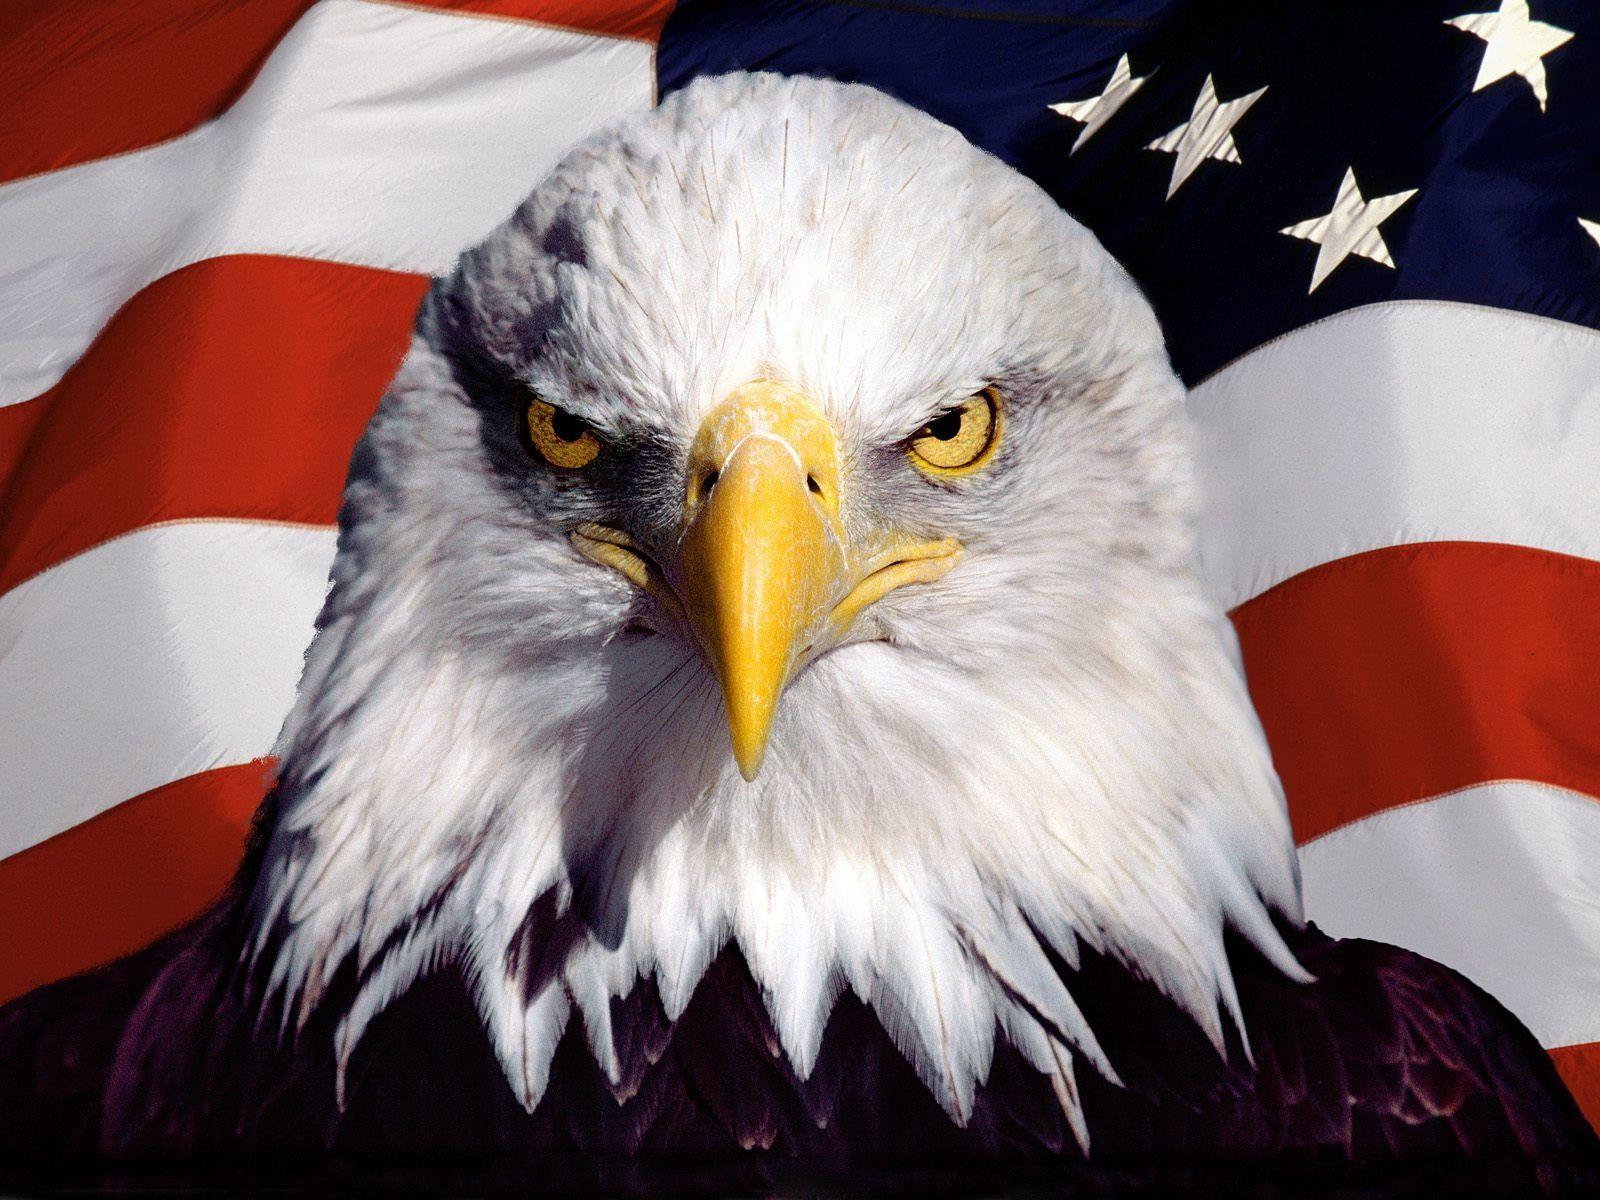 Patriotic Bald Eagle Wallpapers